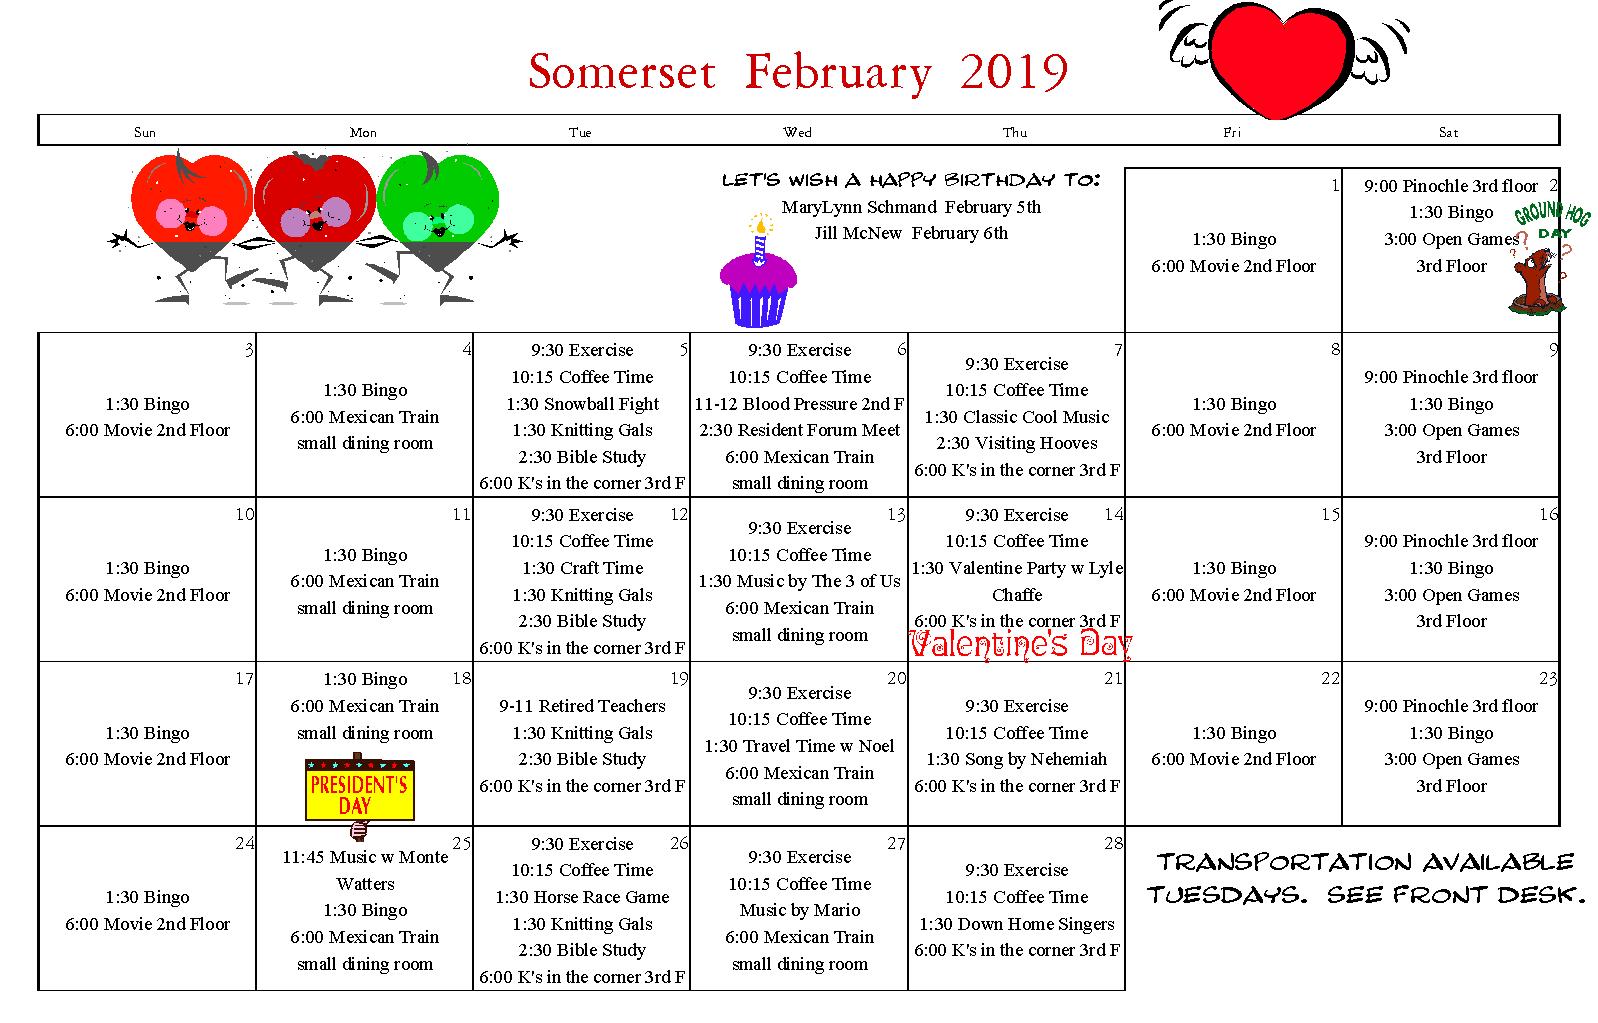 Senior Activity Calendar For February 2019 Senior Calendar February 2019   Somerset Retirement Home and